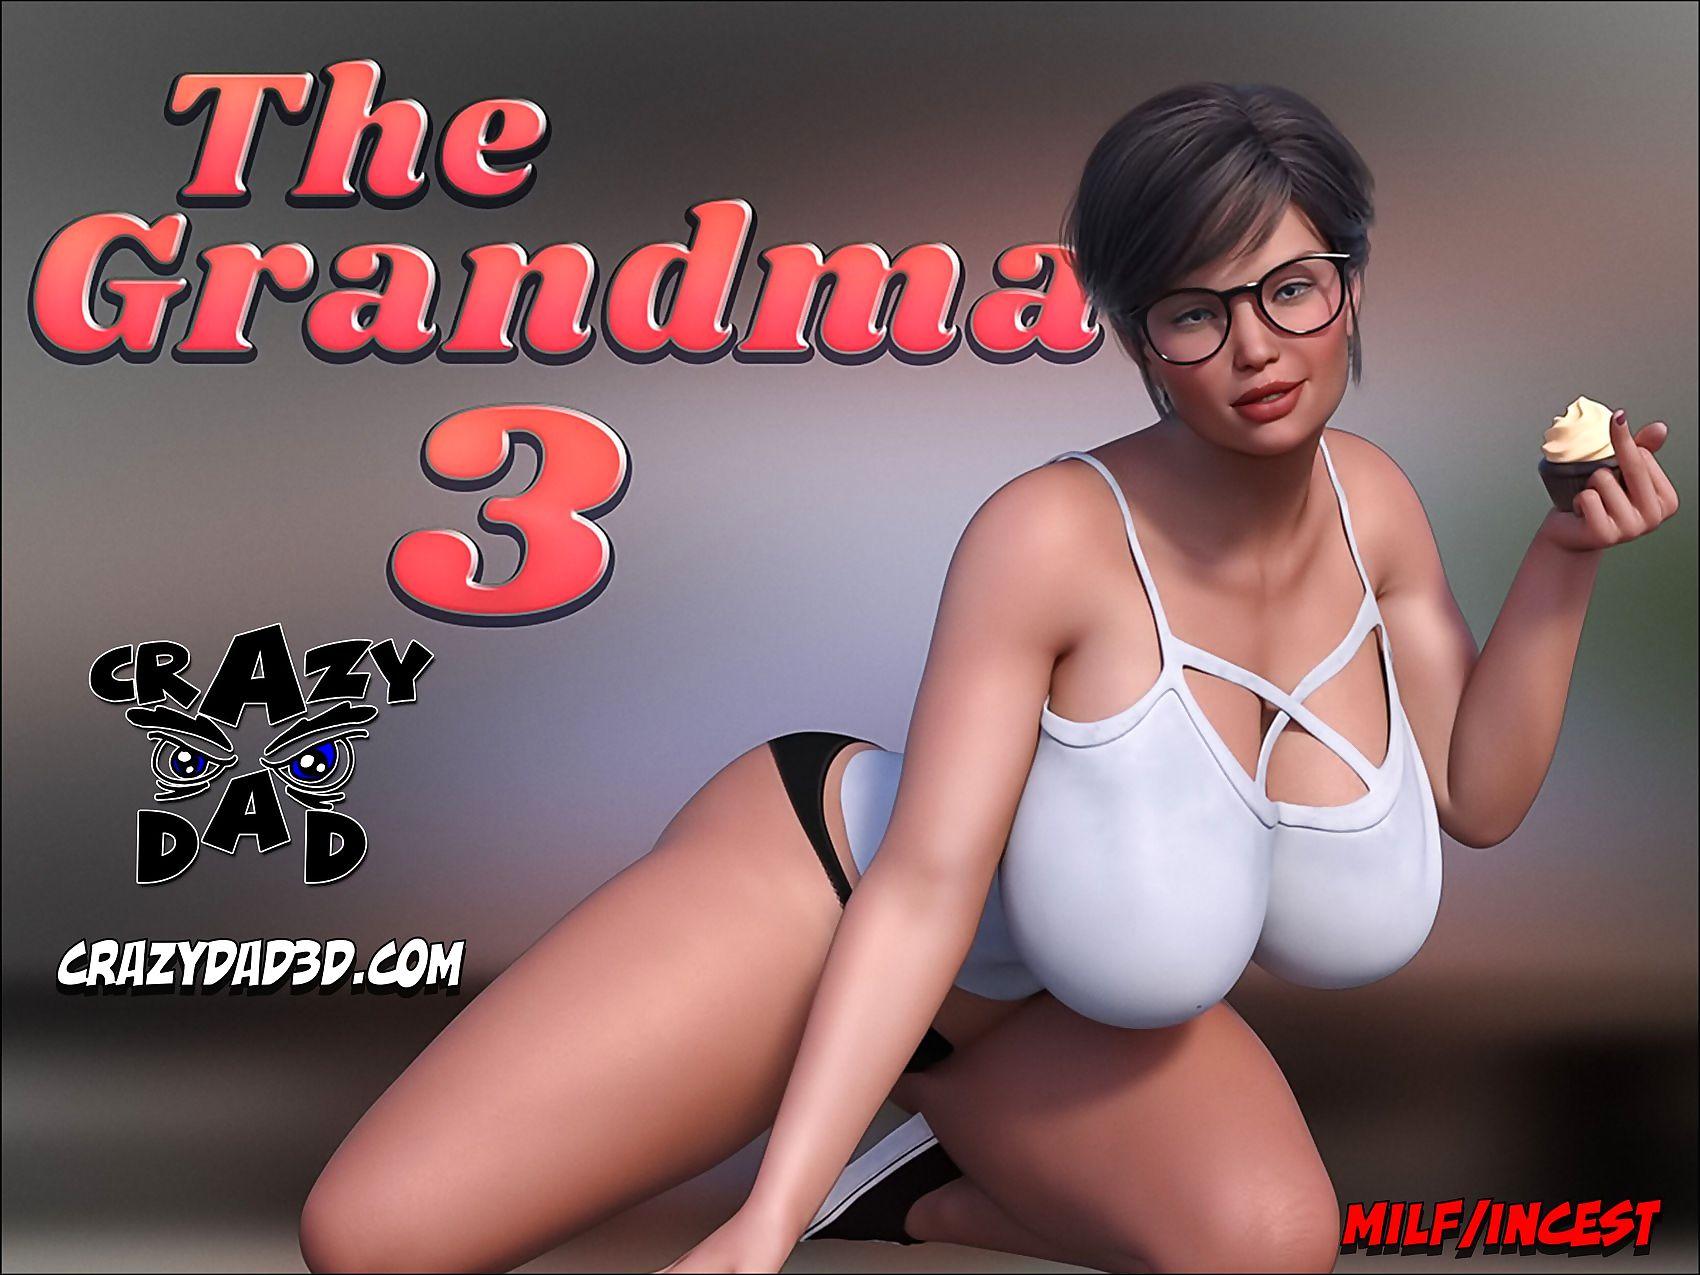 Abuelitas Lesbianas Bsdm Porno Español crazydad- el la abuela 3 en x sexo comics